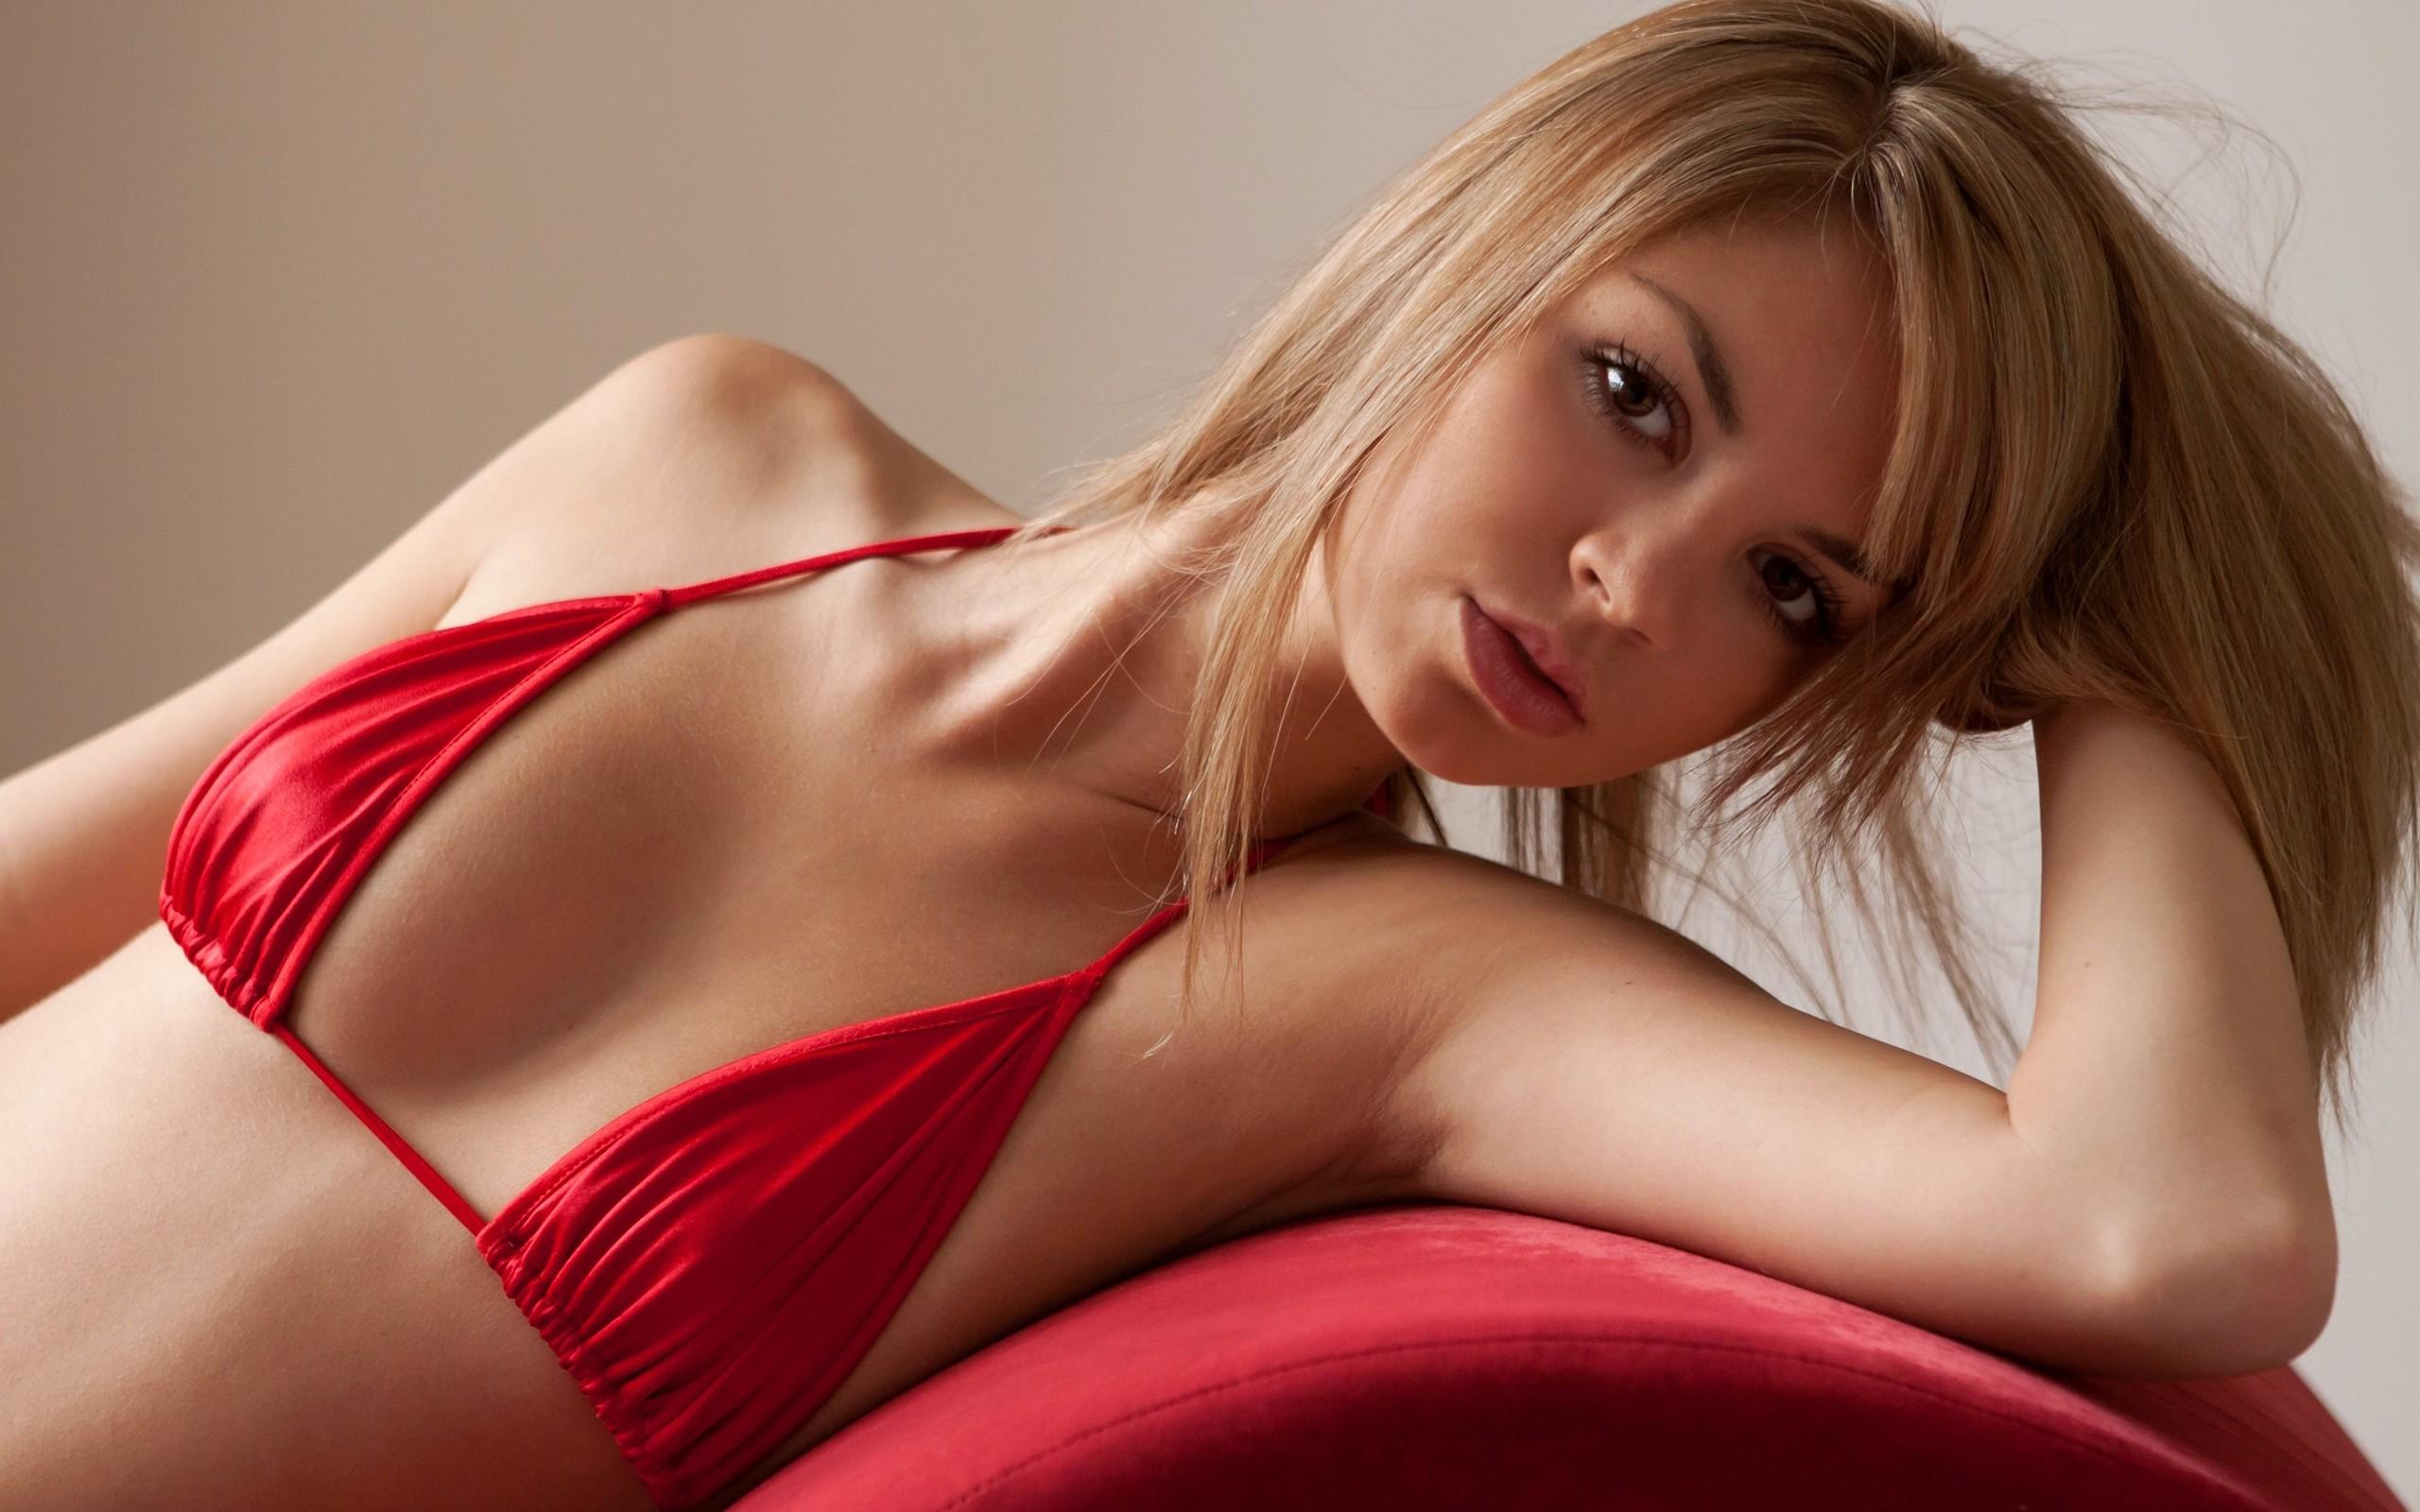 Wallpaper : women, model, blonde, long hair, red, black ...